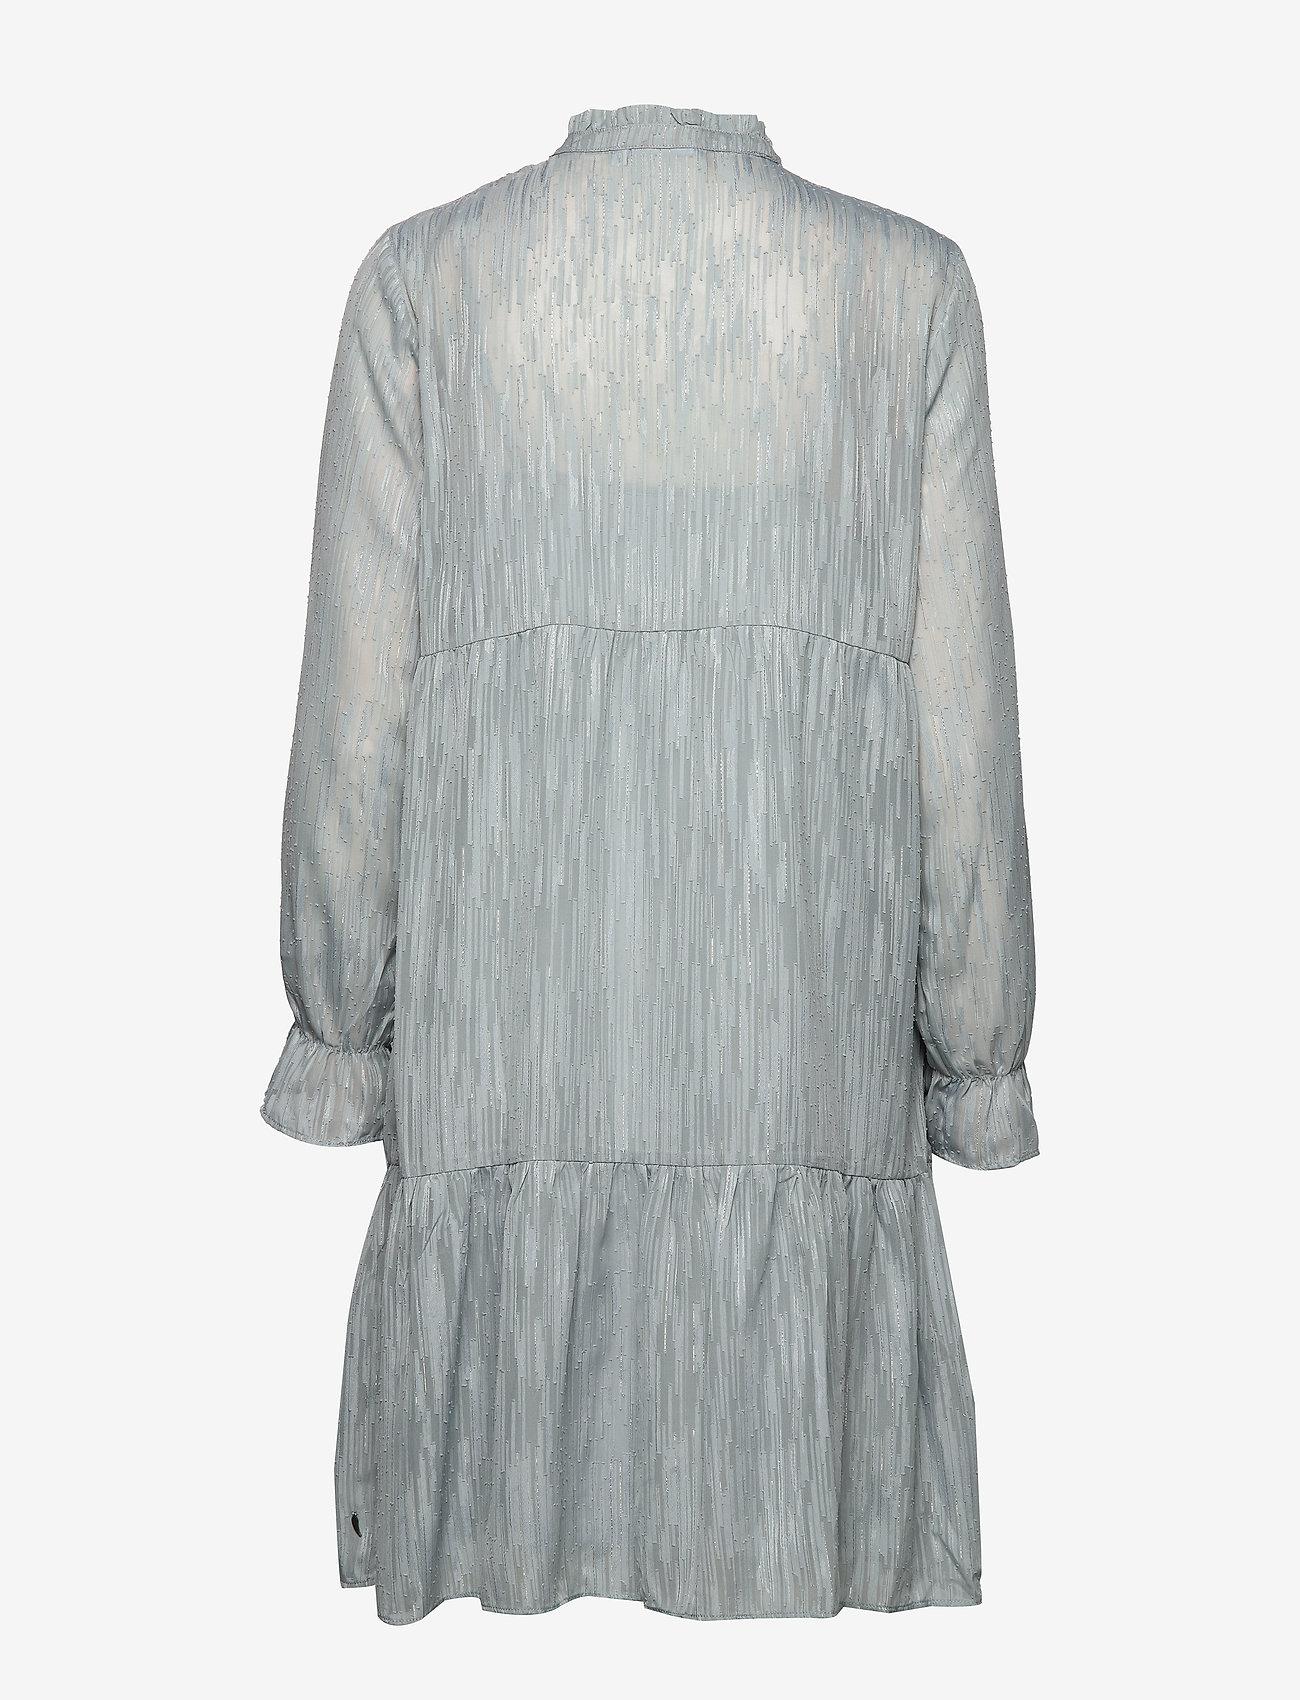 Dress Long Sleeved W. Frill At Neck (Shadow Blue) - Coster Copenhagen hij2jK